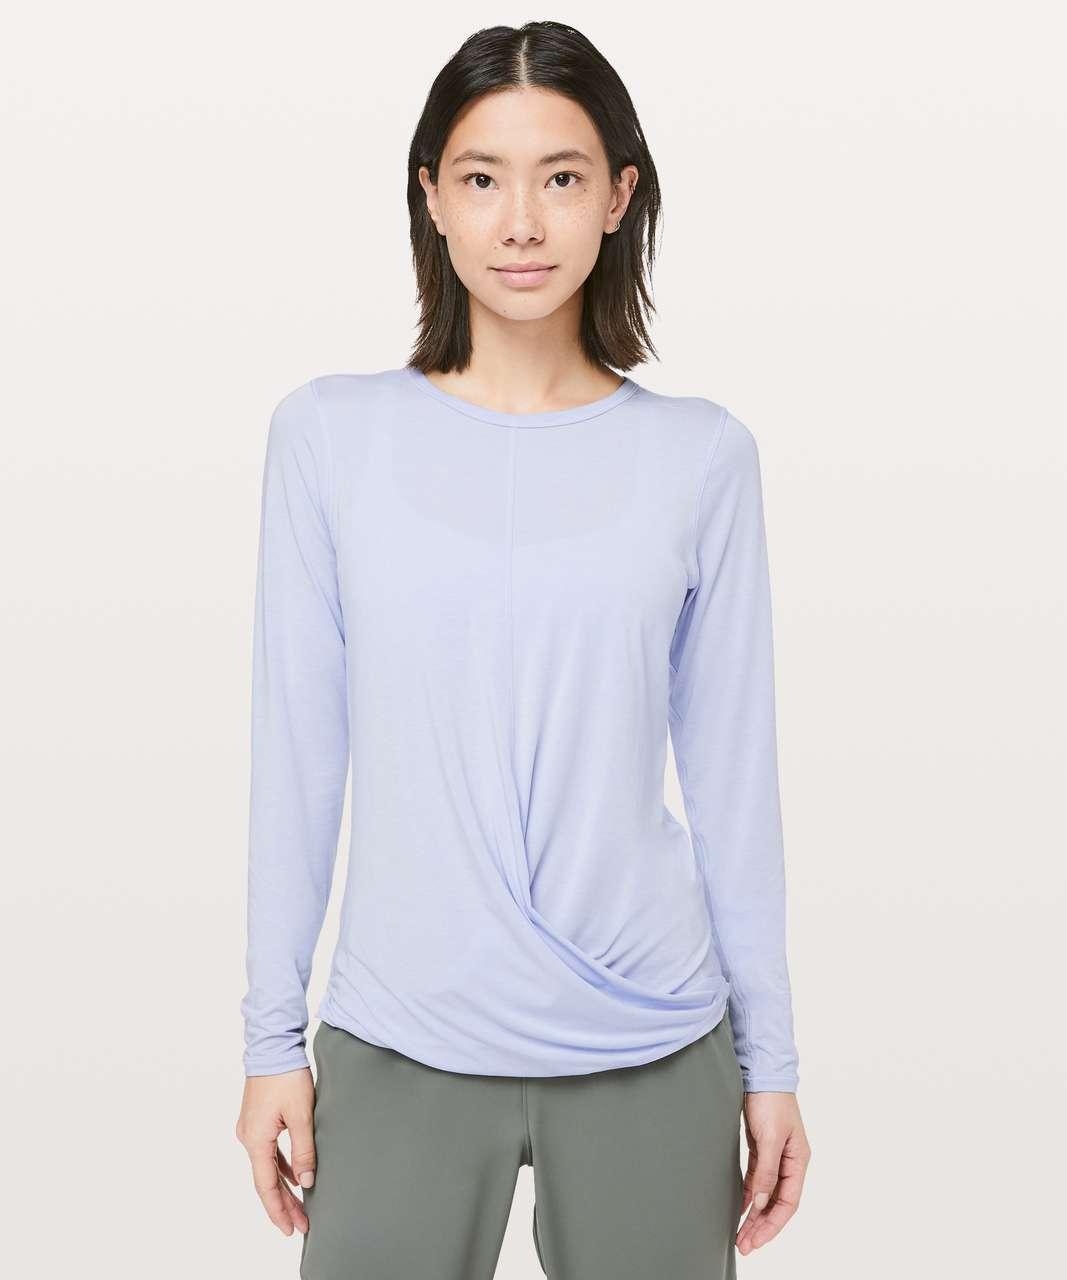 Lululemon Serene Saturday Long Sleeve - Serene Blue